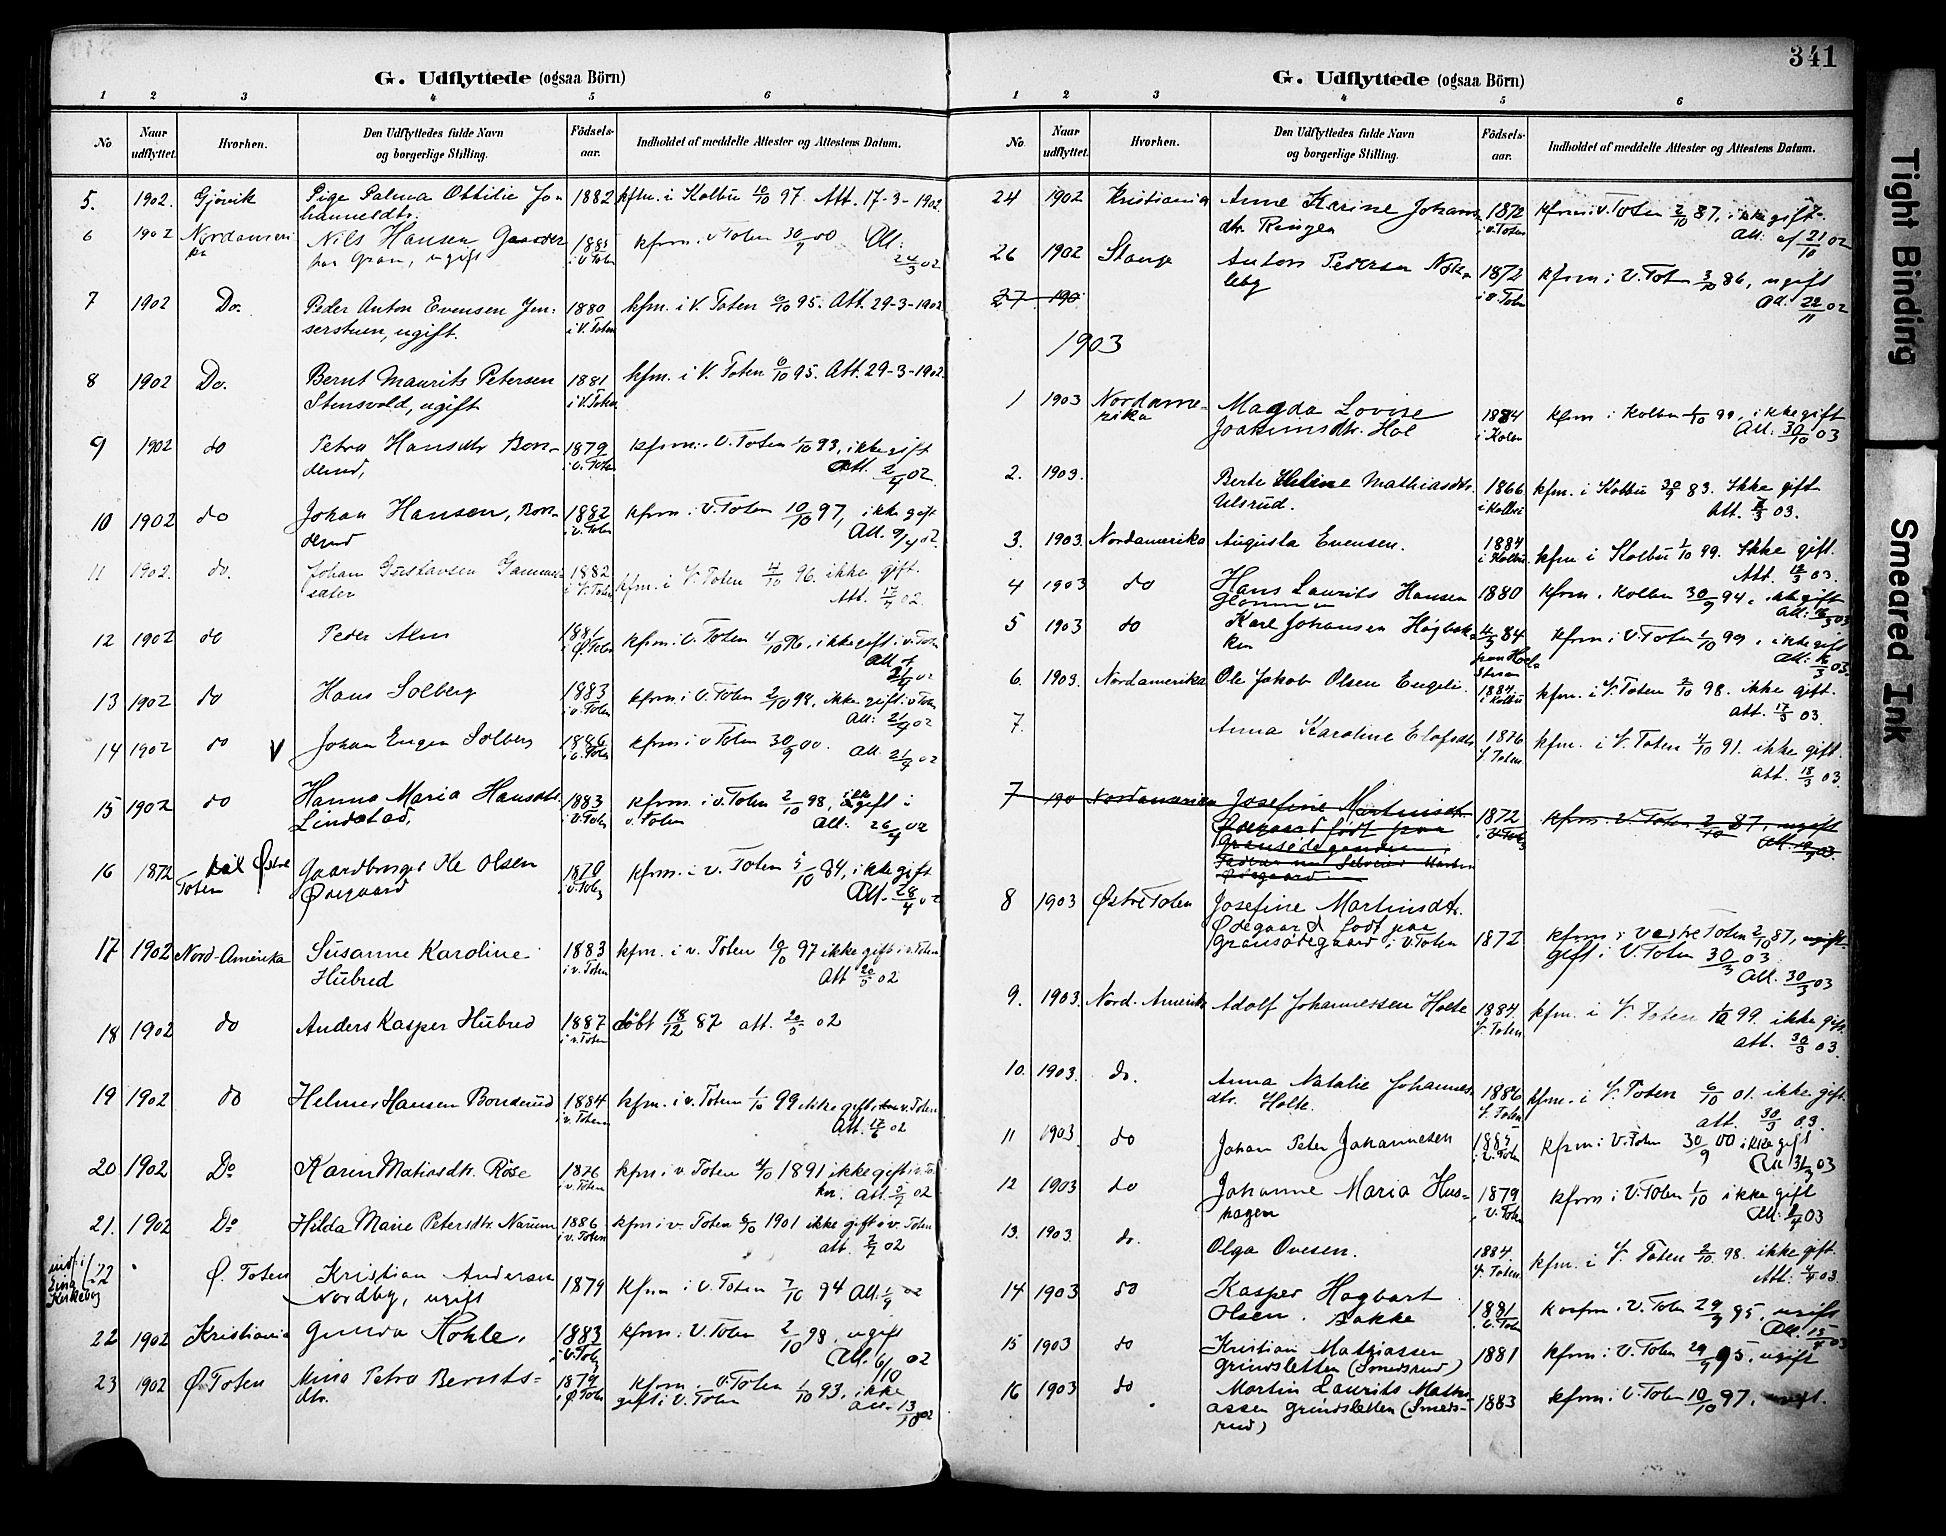 SAH, Vestre Toten prestekontor, H/Ha/Haa/L0013: Ministerialbok nr. 13, 1895-1911, s. 341